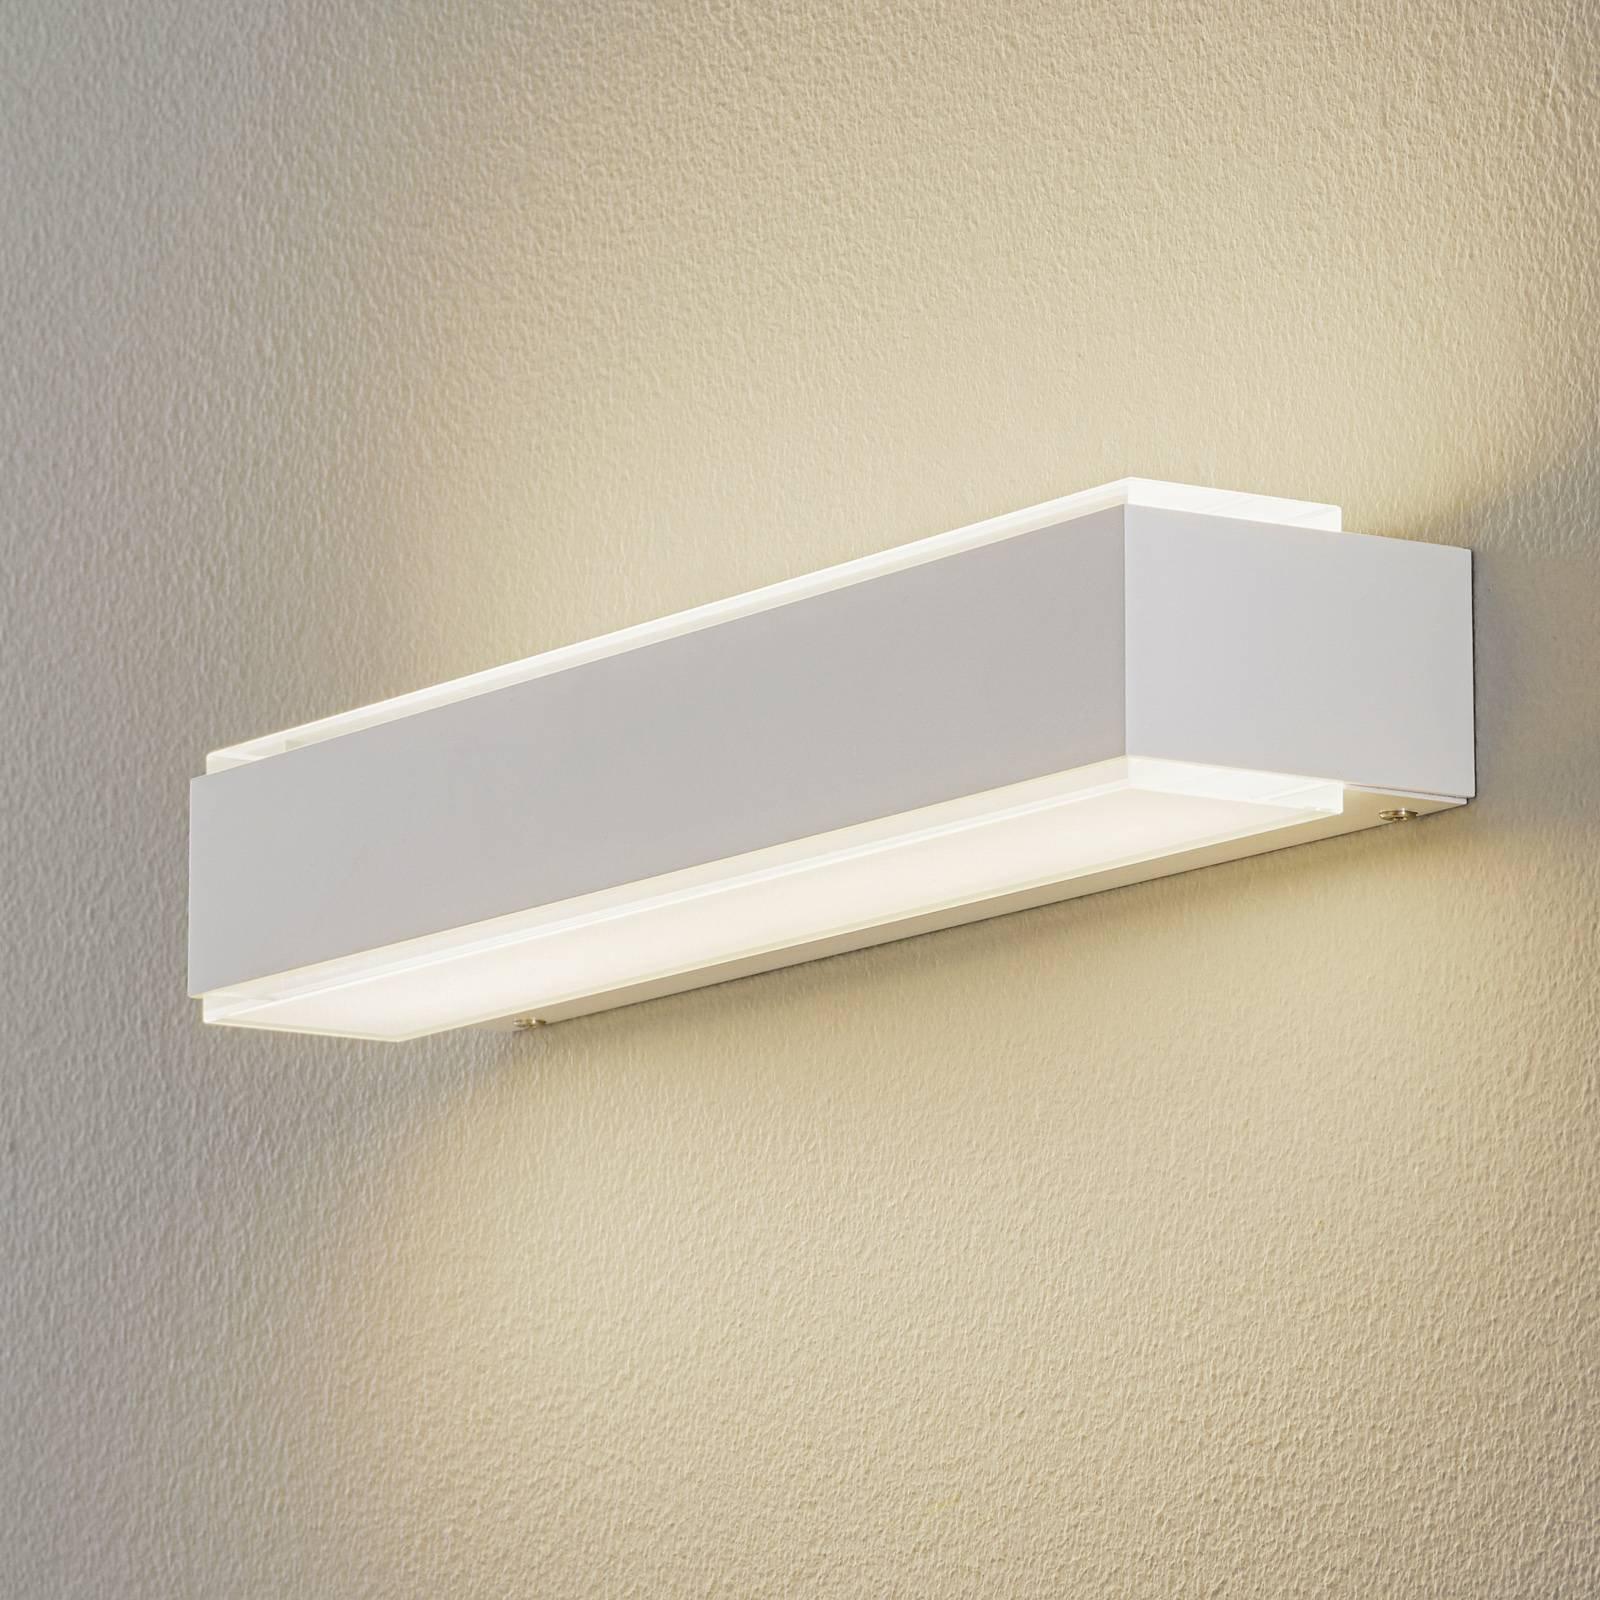 BEGA 78625 LED-vegglampe 3 000 K 40 cm hvit